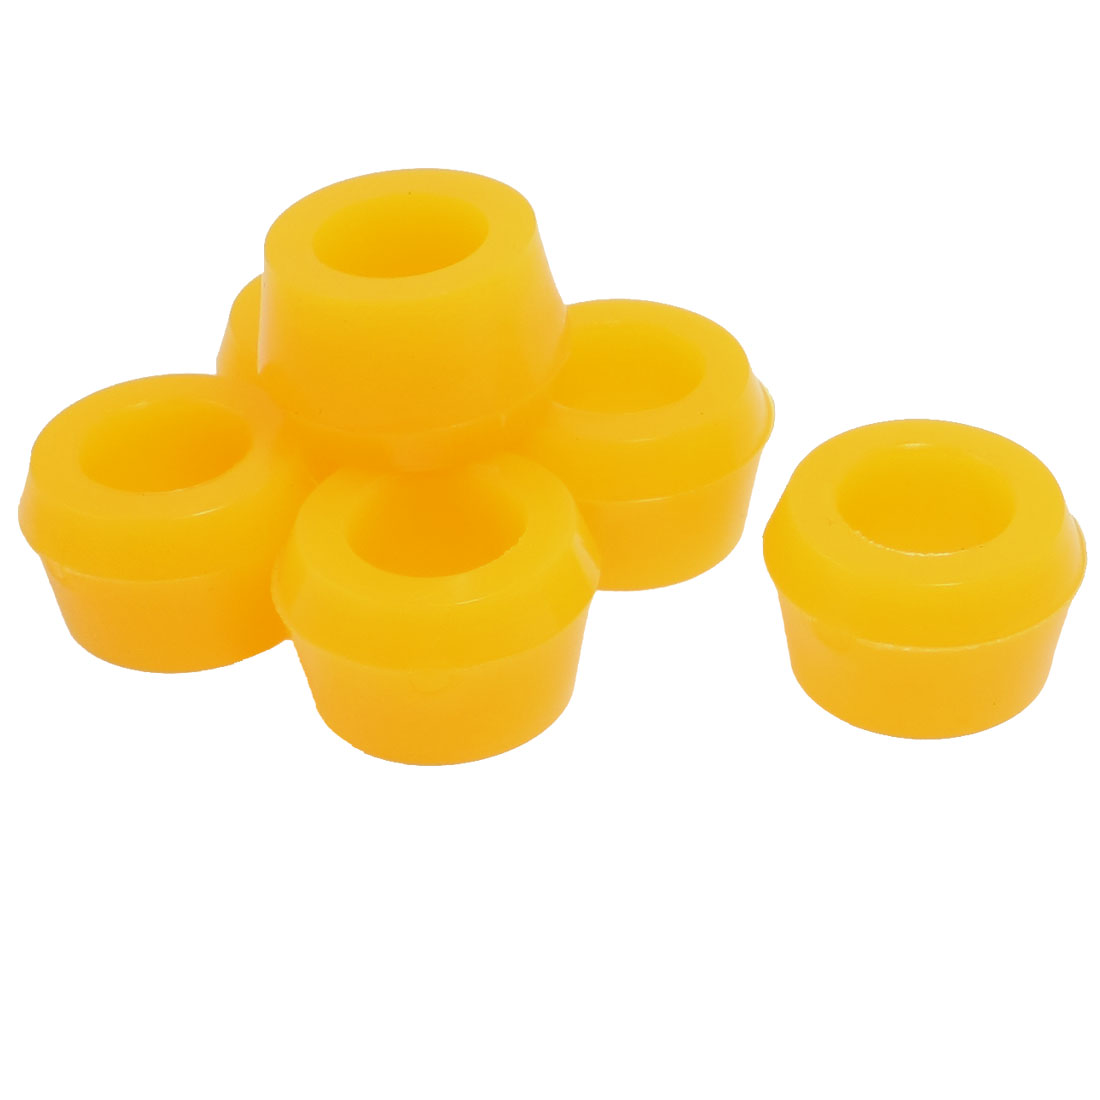 6 Pcs 19mm Inside Diameter Orange Rubber Shock Absorber Bushings Part